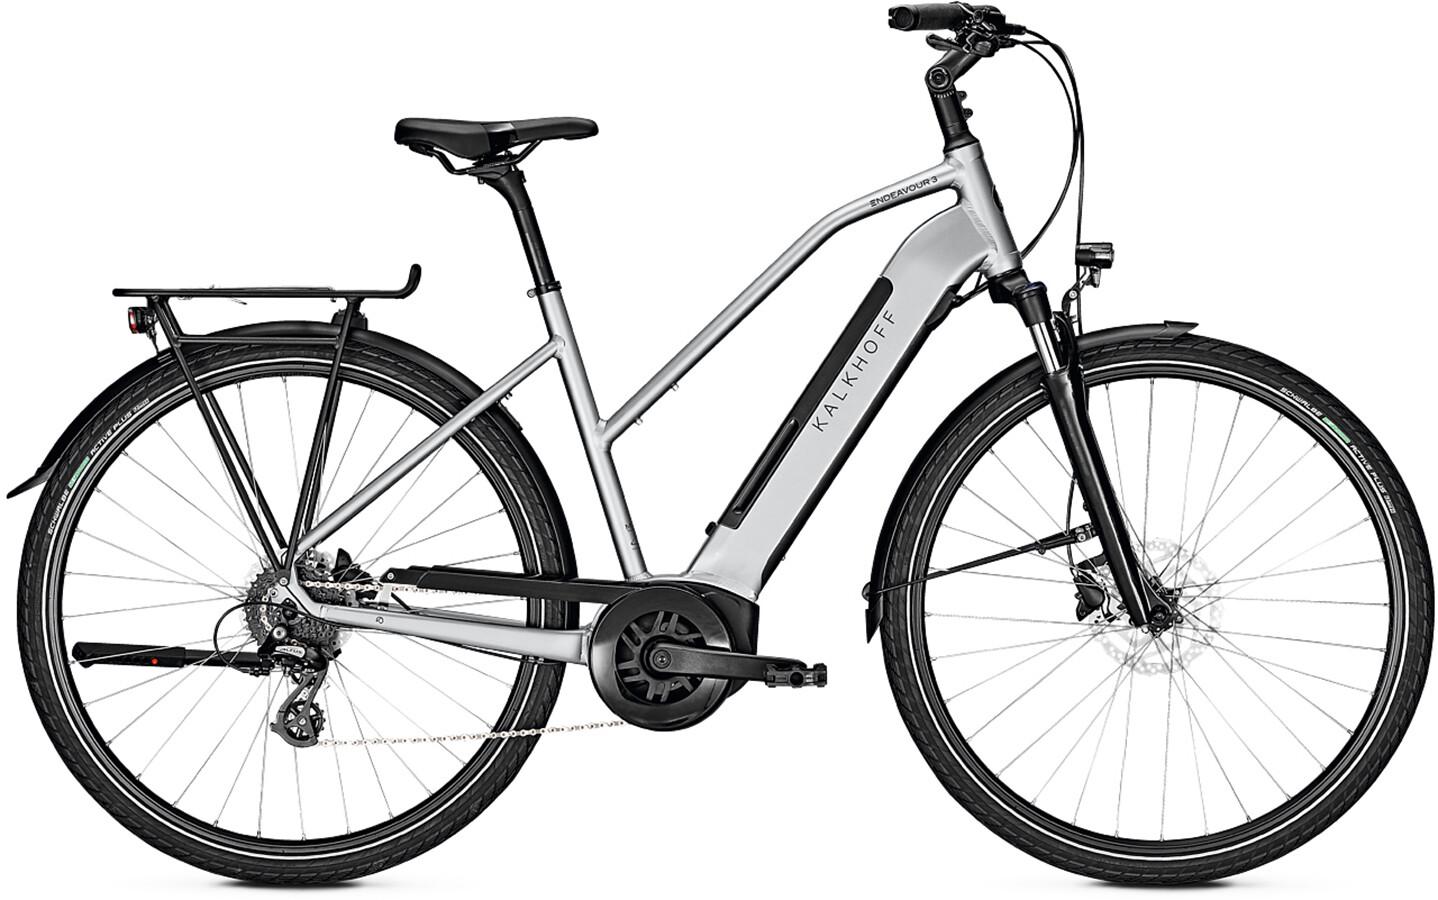 Kalkhoff Endeavour 3.B Move Trapeze 400Wh, smoke silver glossy | City-cykler